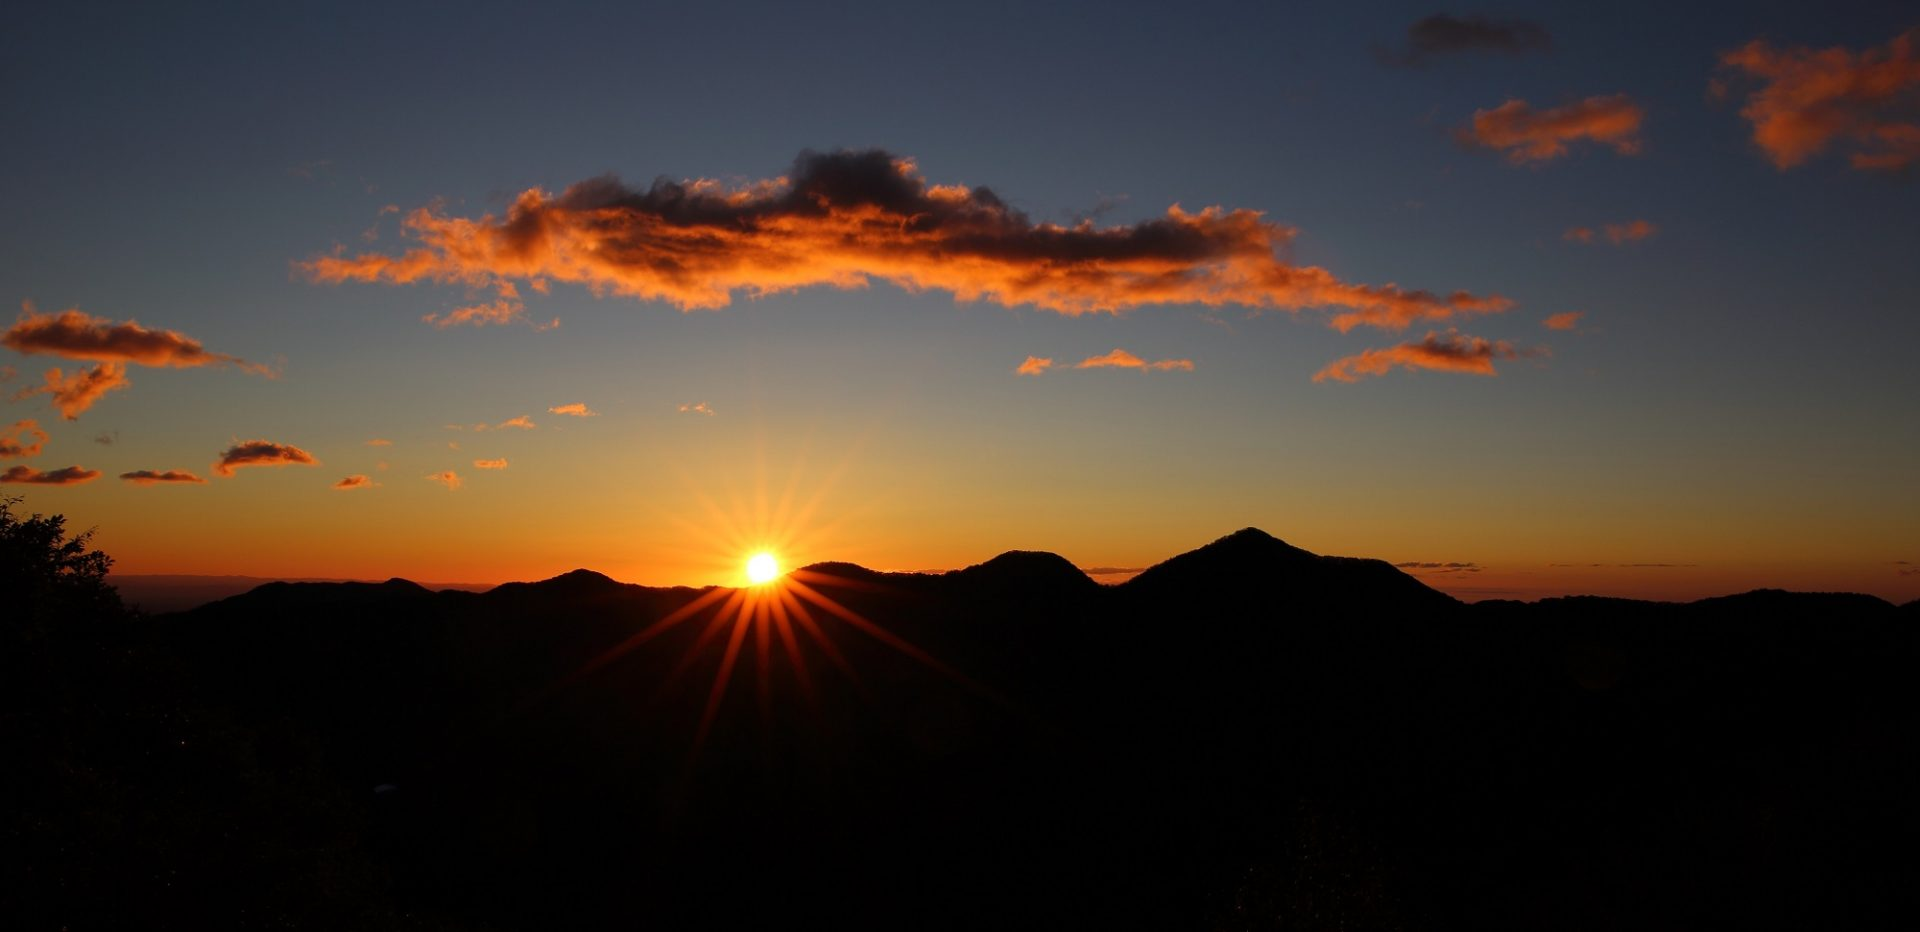 Solnedgang eller måske en solopgang?